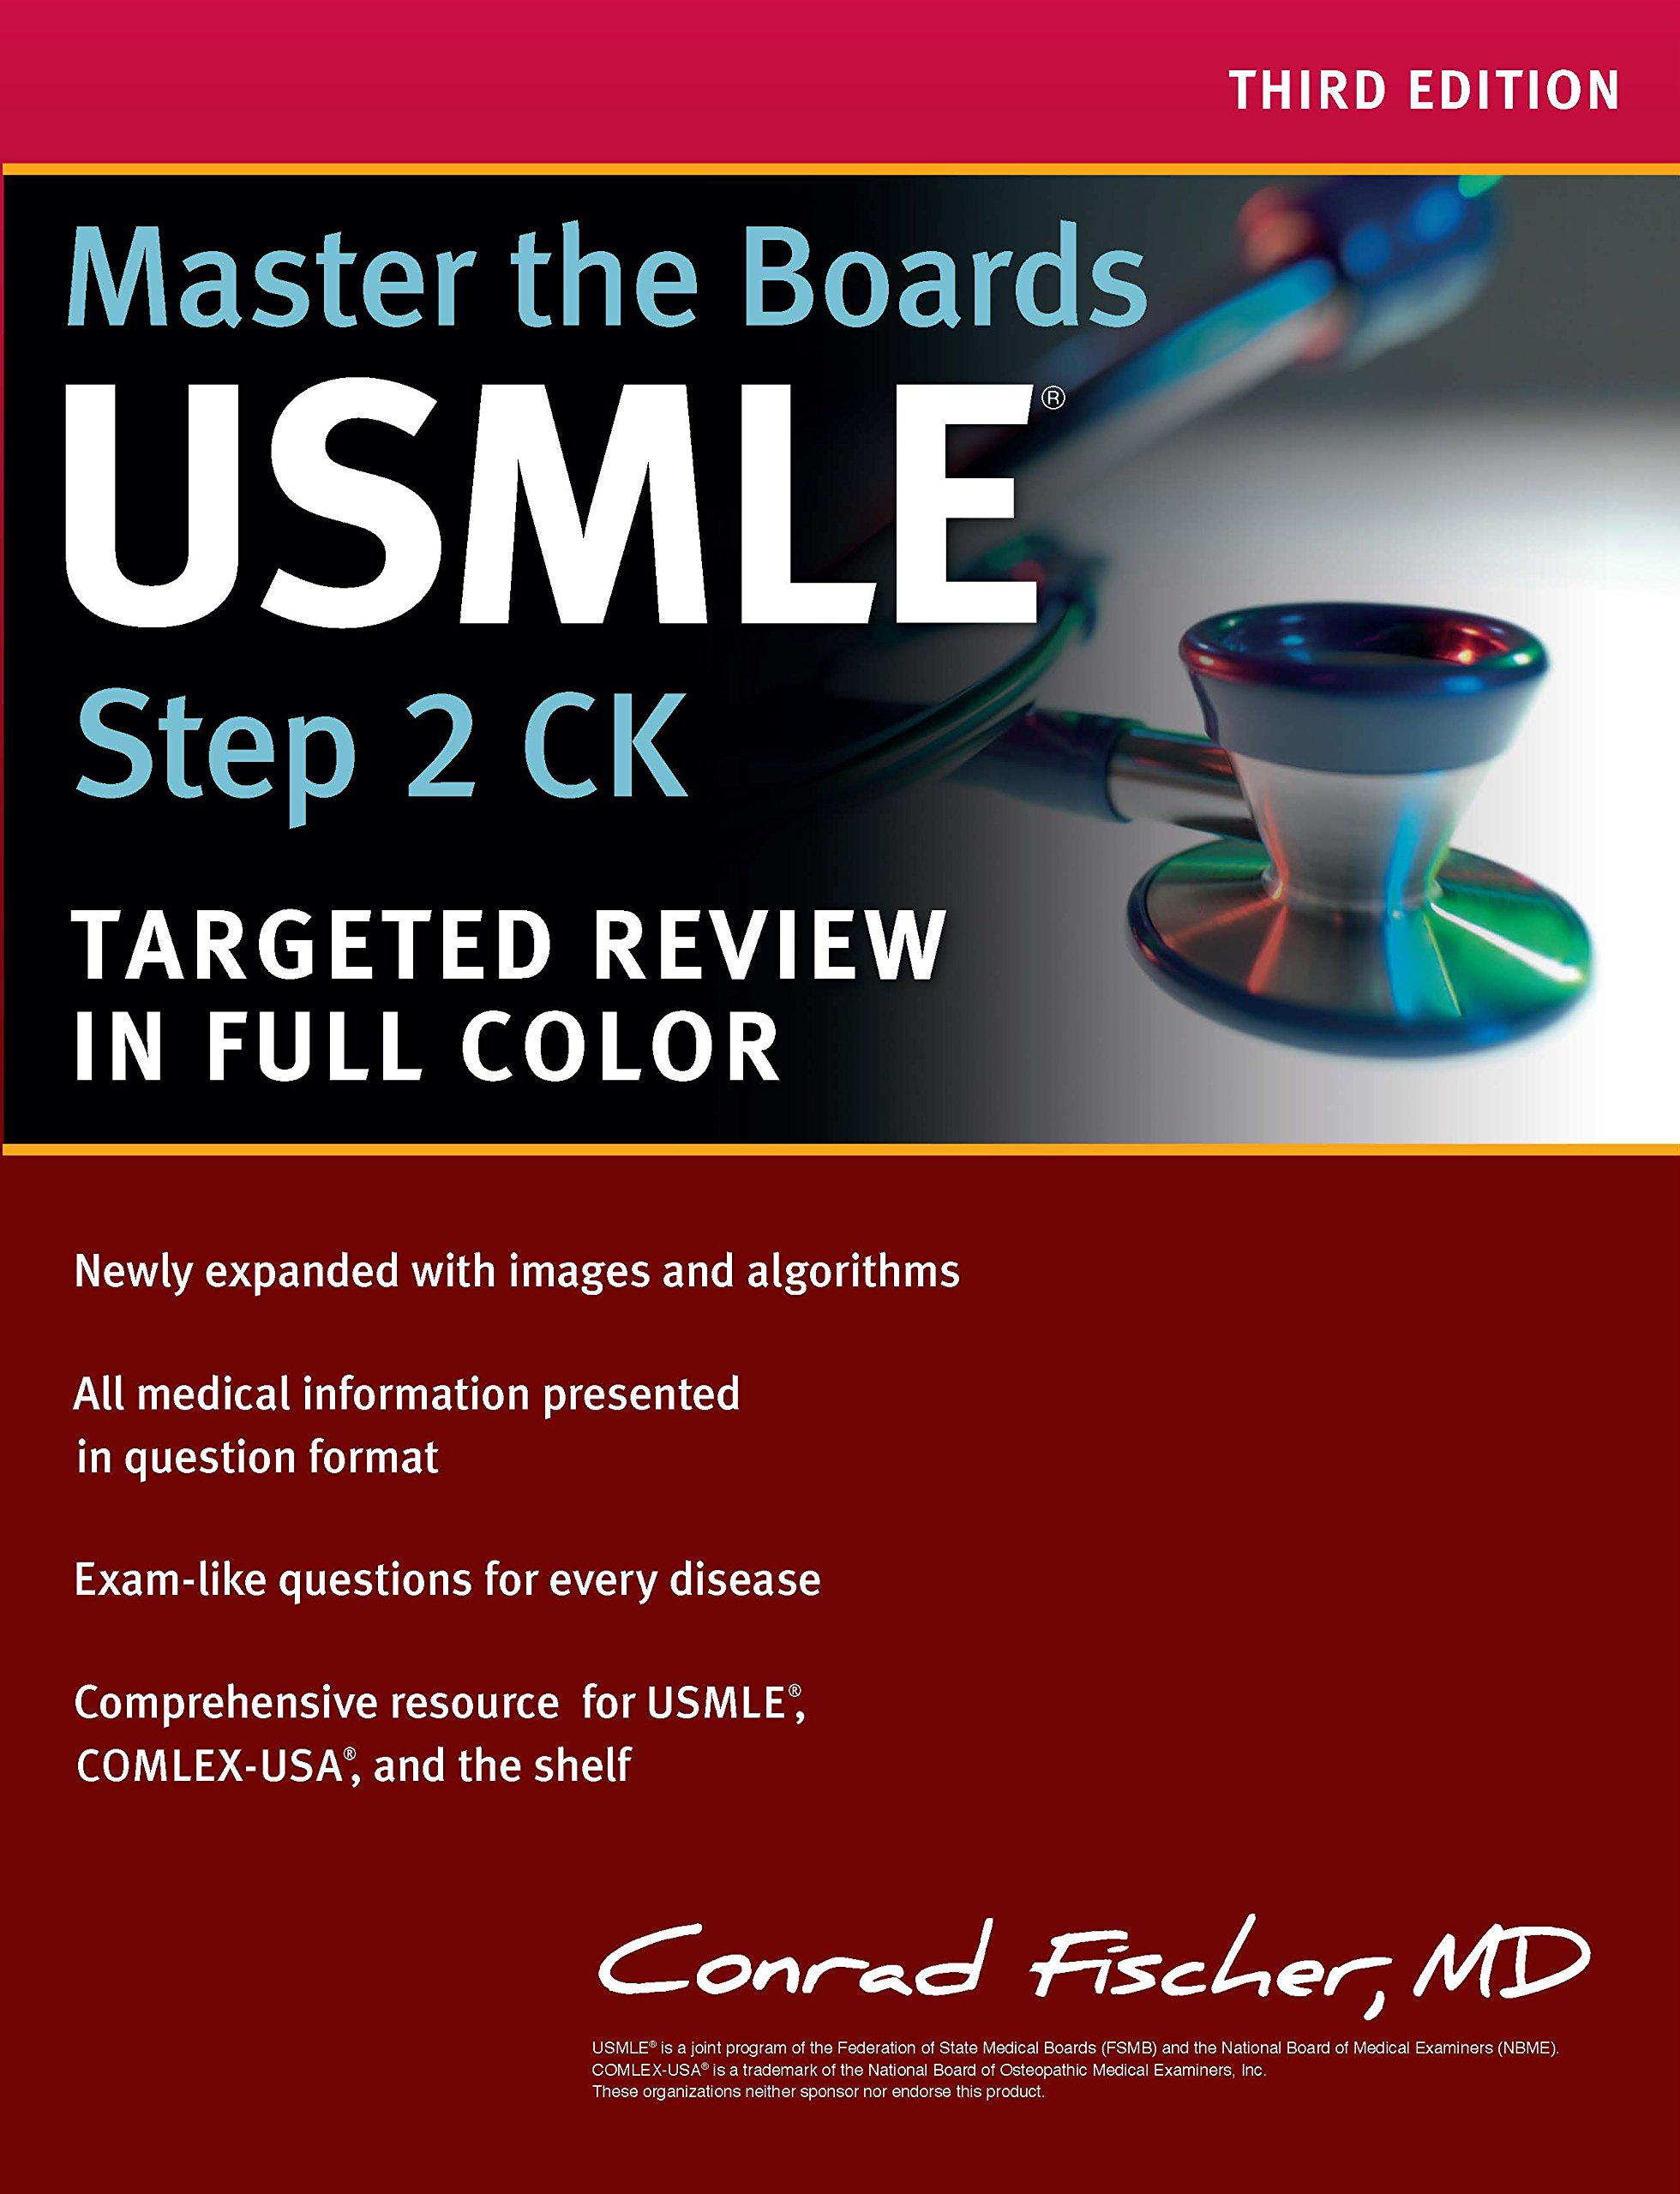 Master the Boards USMLE Step 2 CK: Kaplan Publishing: 9781784157791